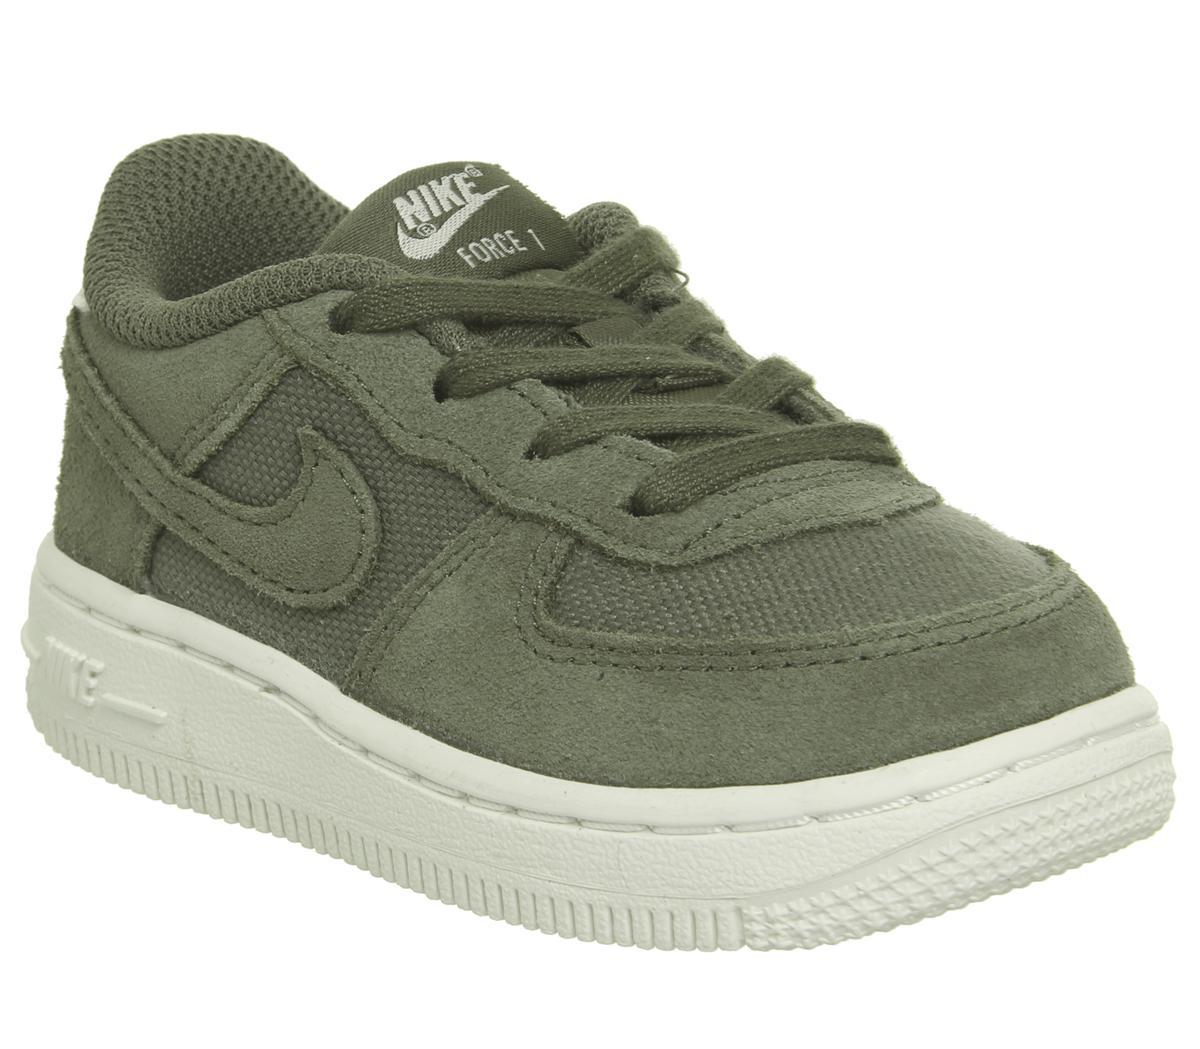 Nike Air Force 1 Infant Trainers Khaki